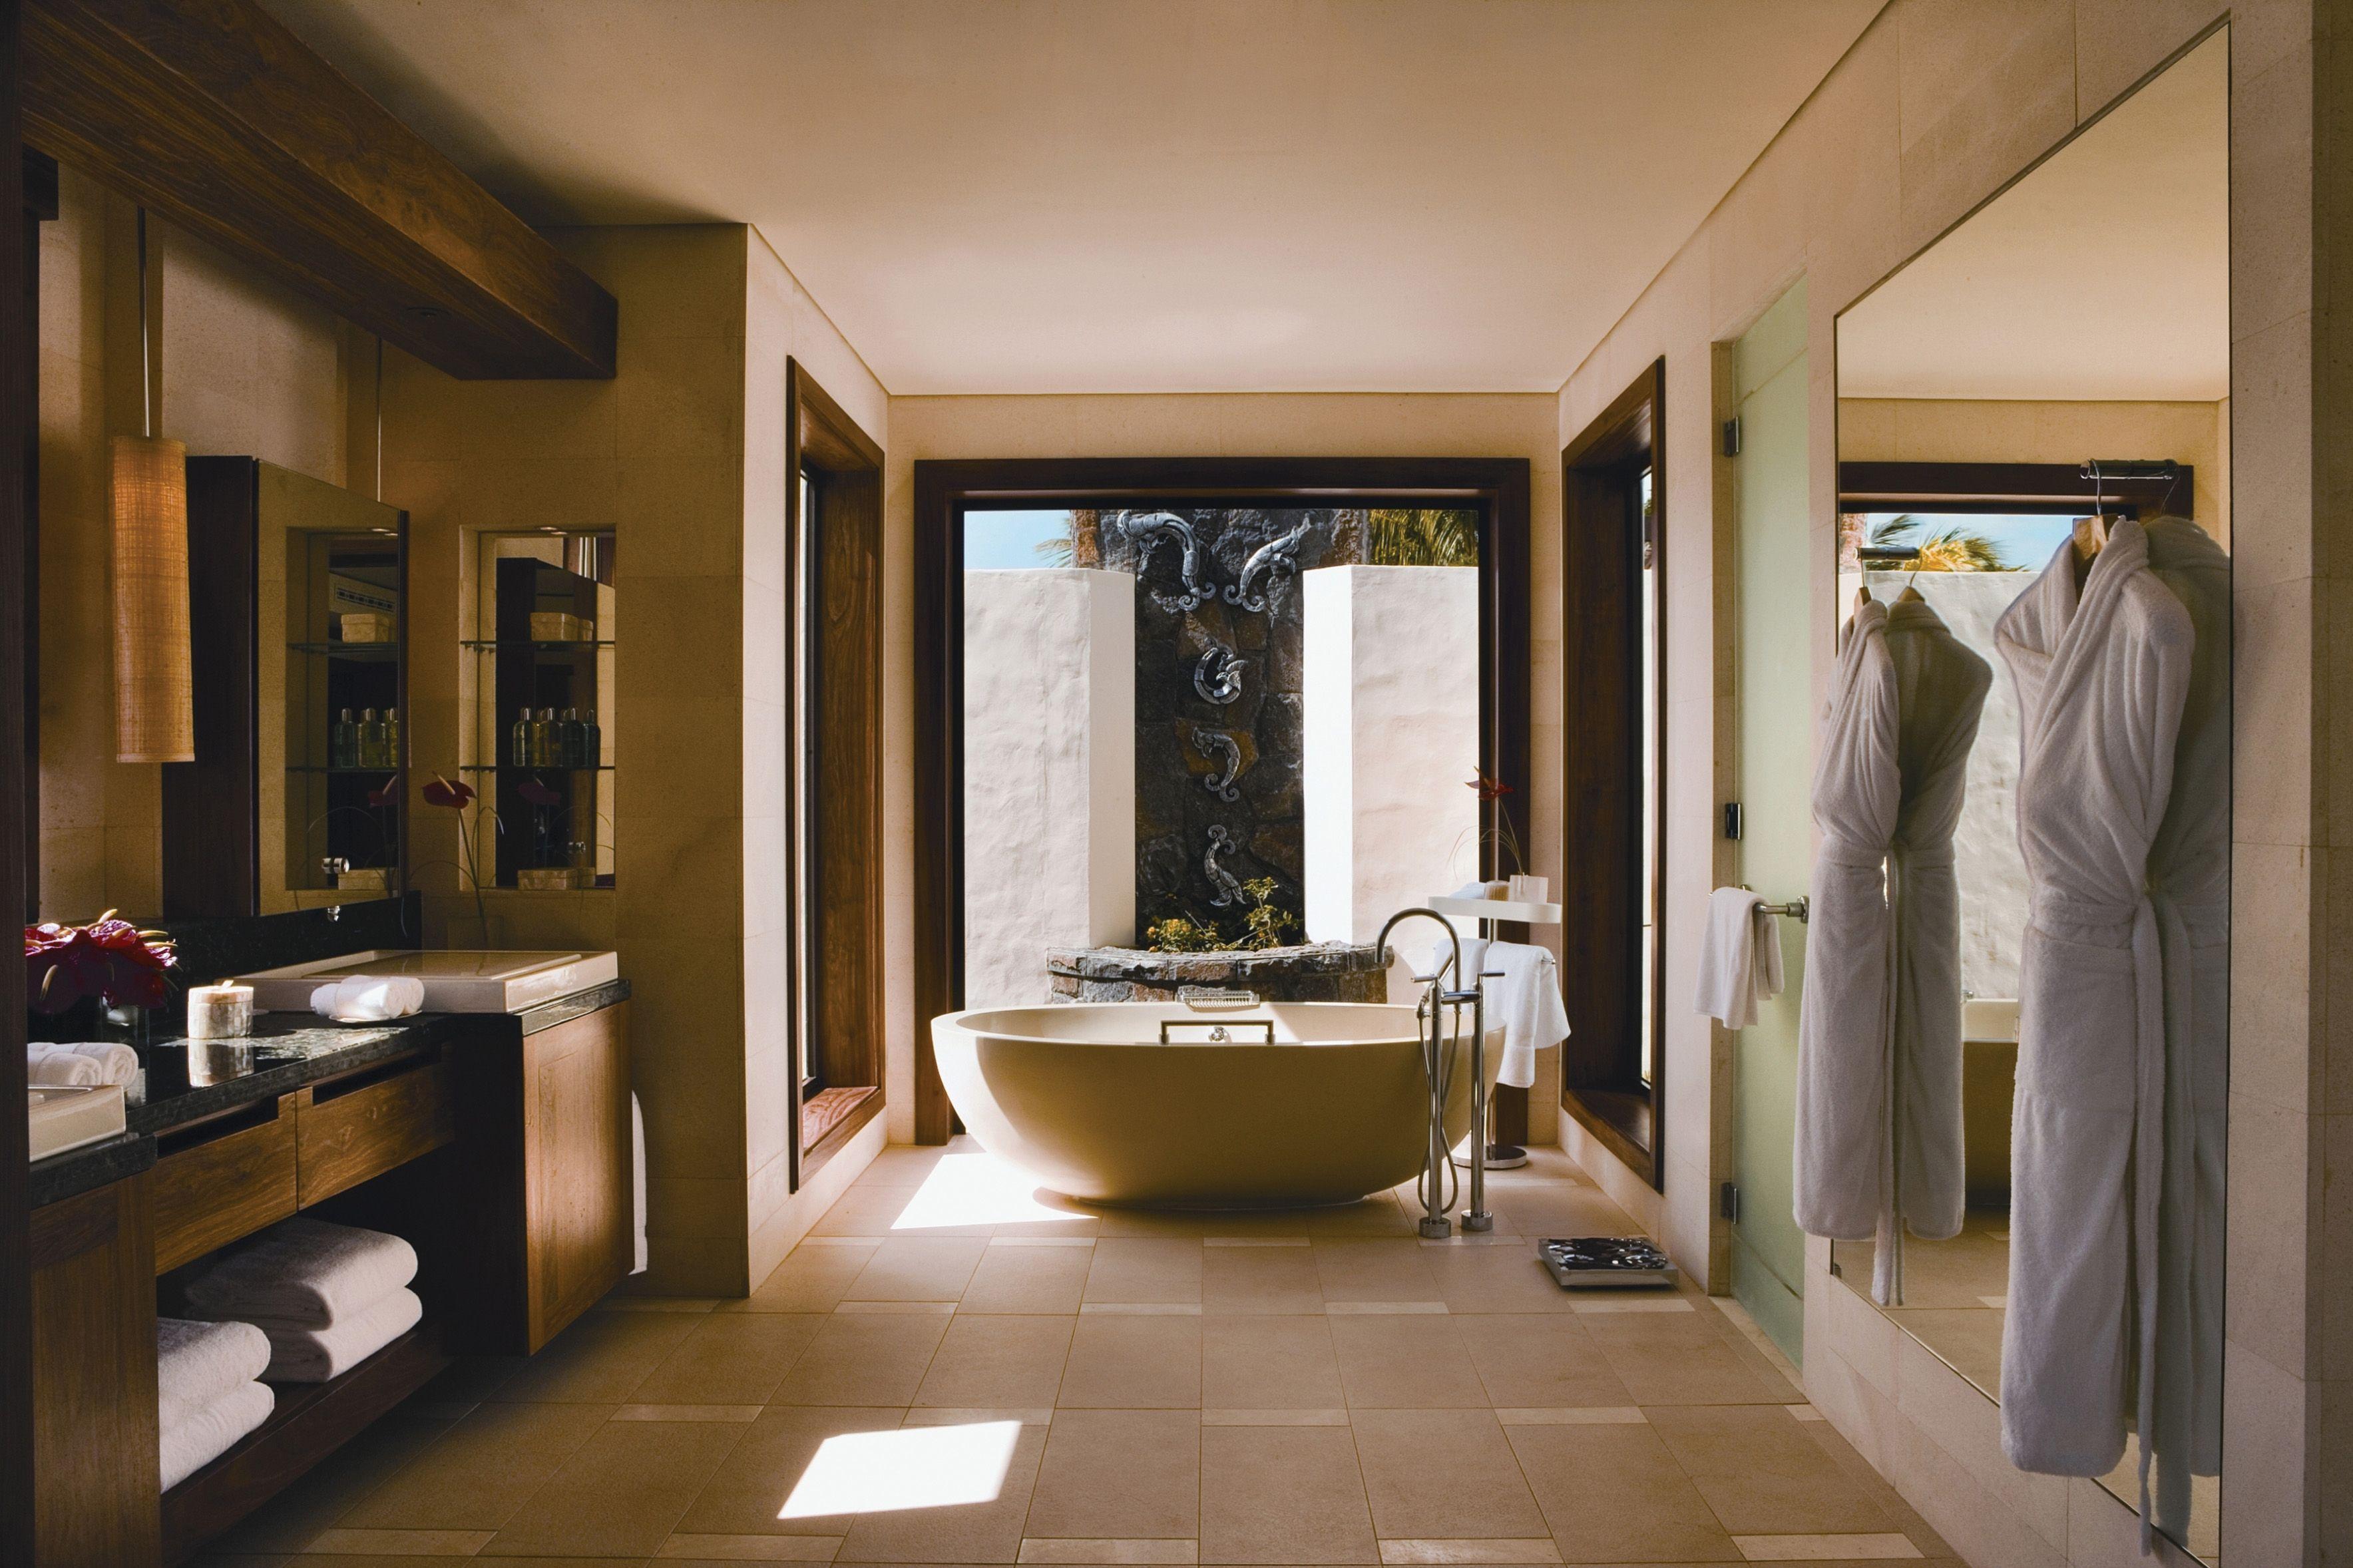 Le touessrok mauritius leisure island holidays luxurybathrooms